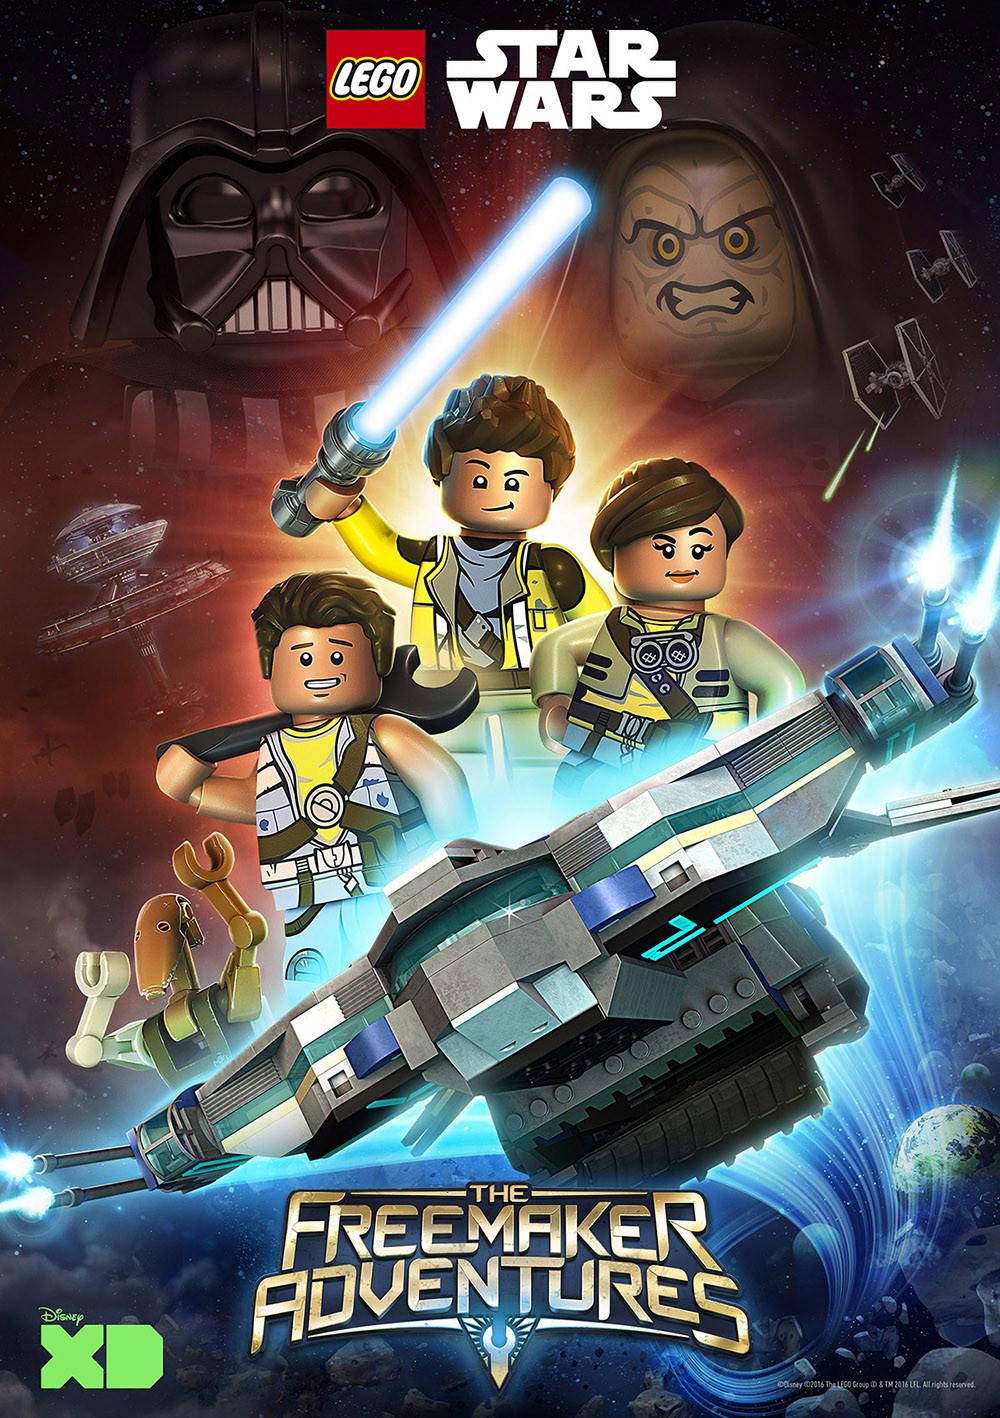 LEGO-Star-Wars-The-Freemaker-Adventures